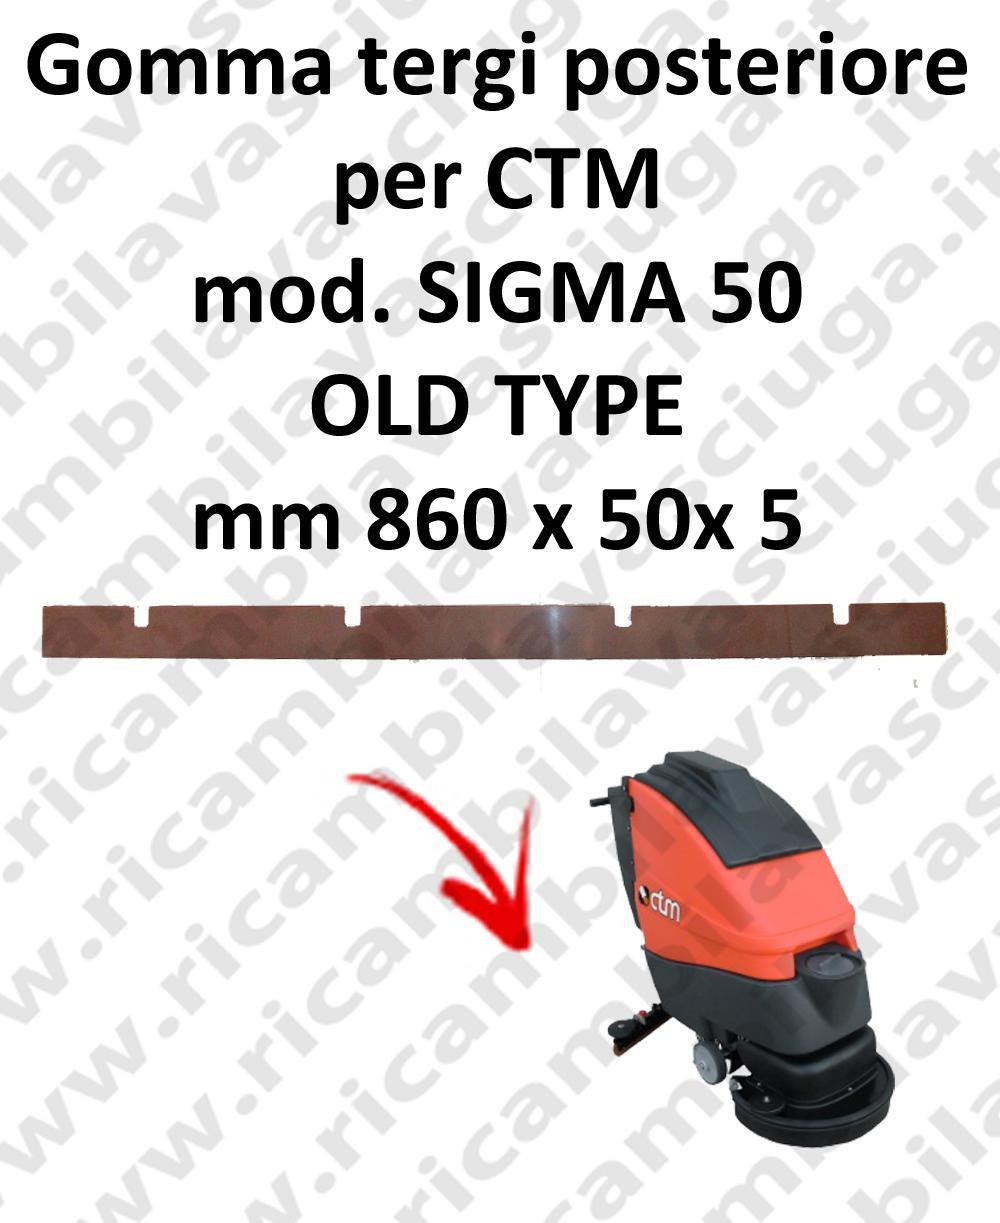 SIGMA 50 OLD TYPE goma de secado trasero para fregadora CTM